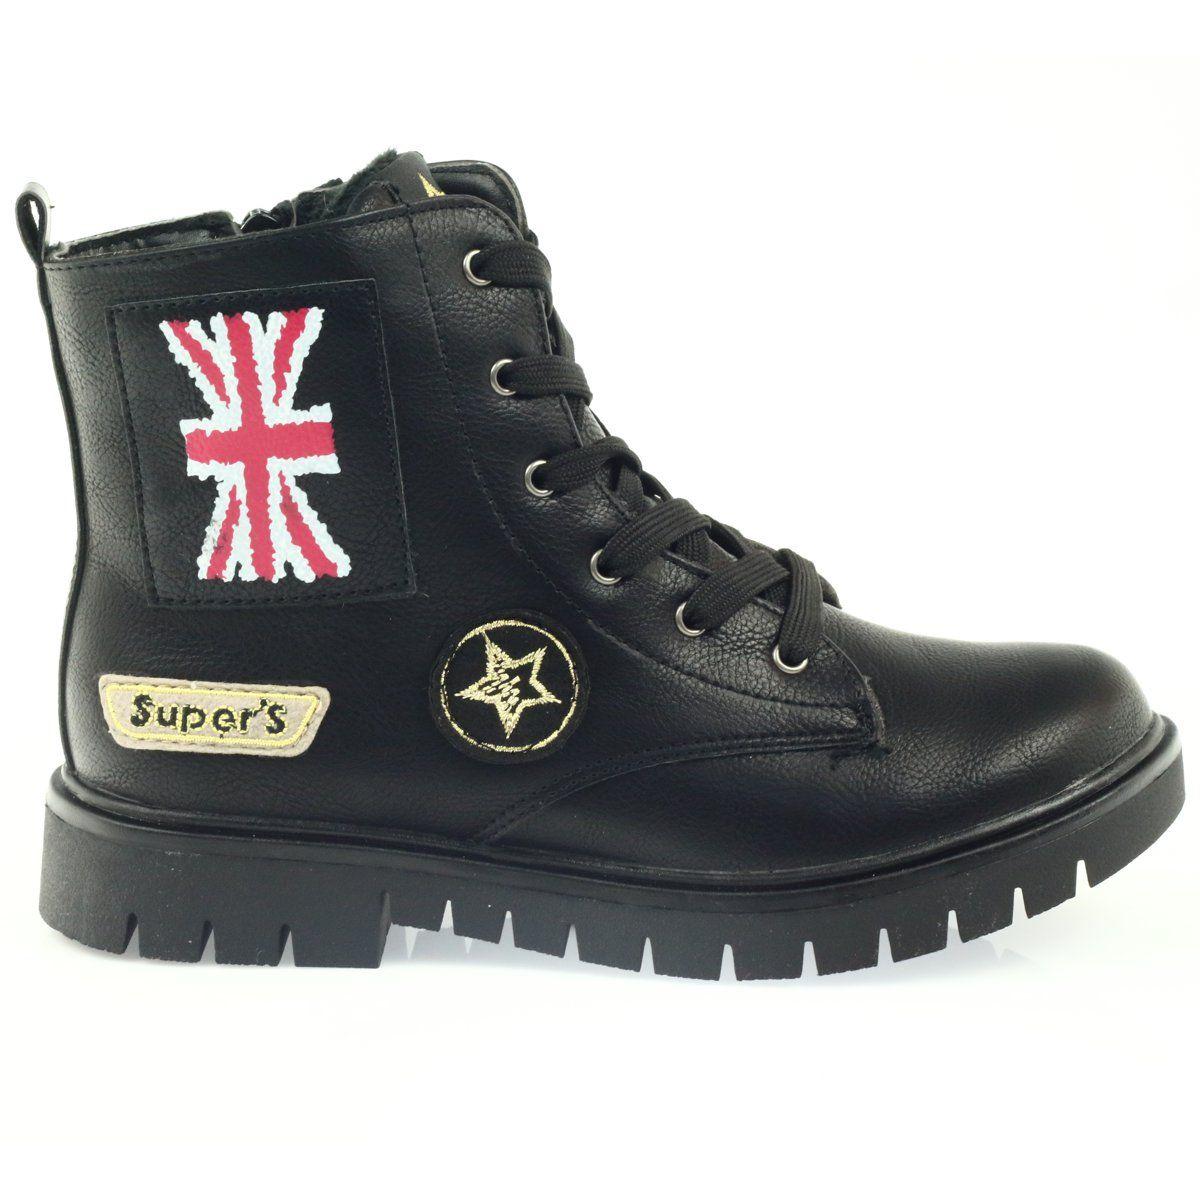 American Club American Super Workery Buty Zimowe Czarne Zolte Czerwone Hiking Boots Shoes Boots